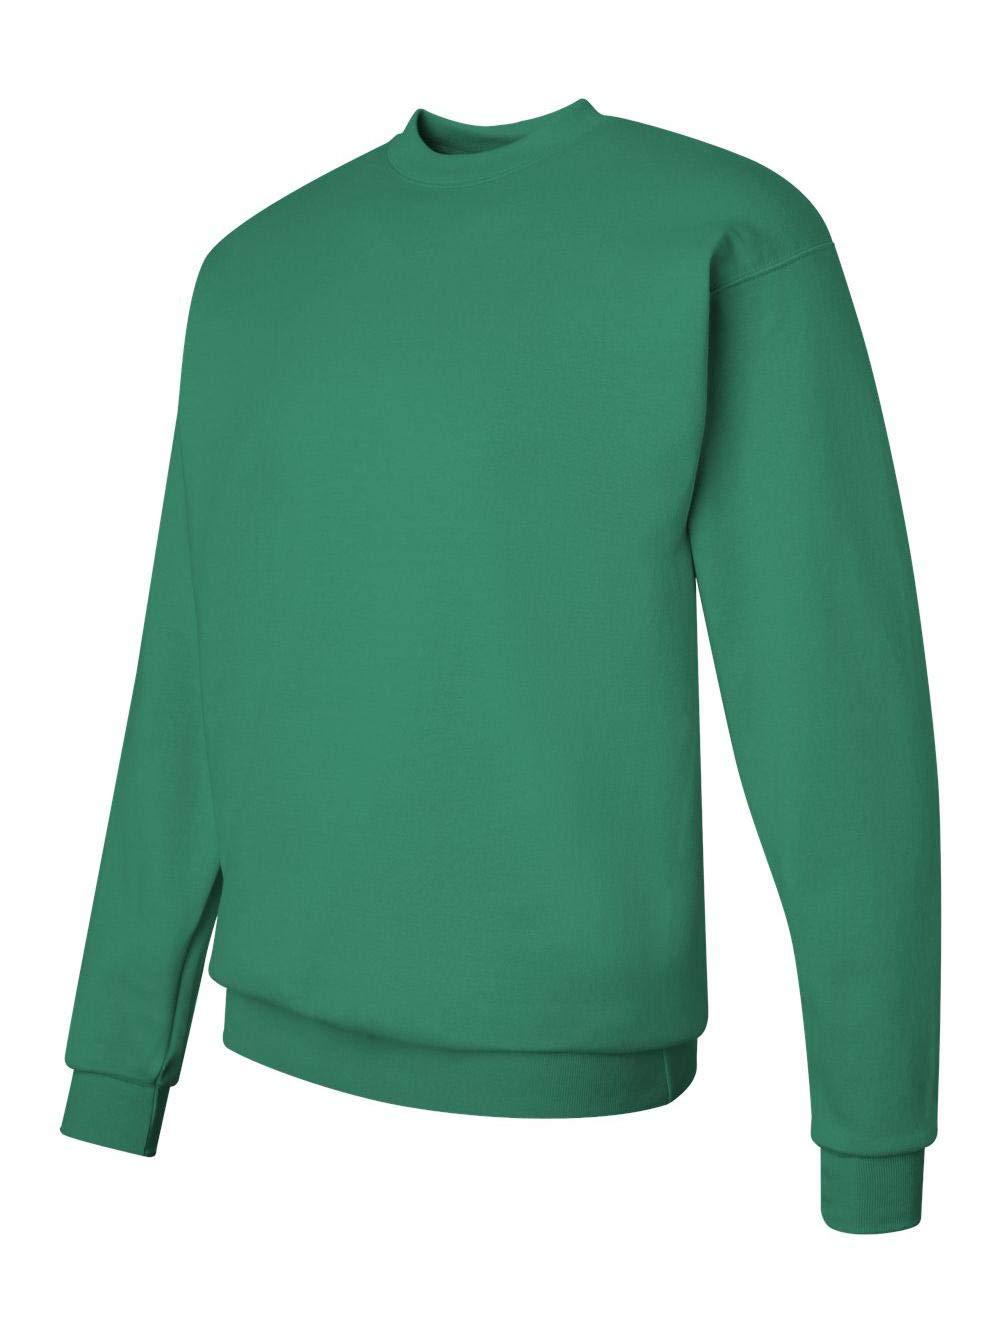 Hanes Men's EcoSmart Fleece Sweatshirt, Kelly Green Medium